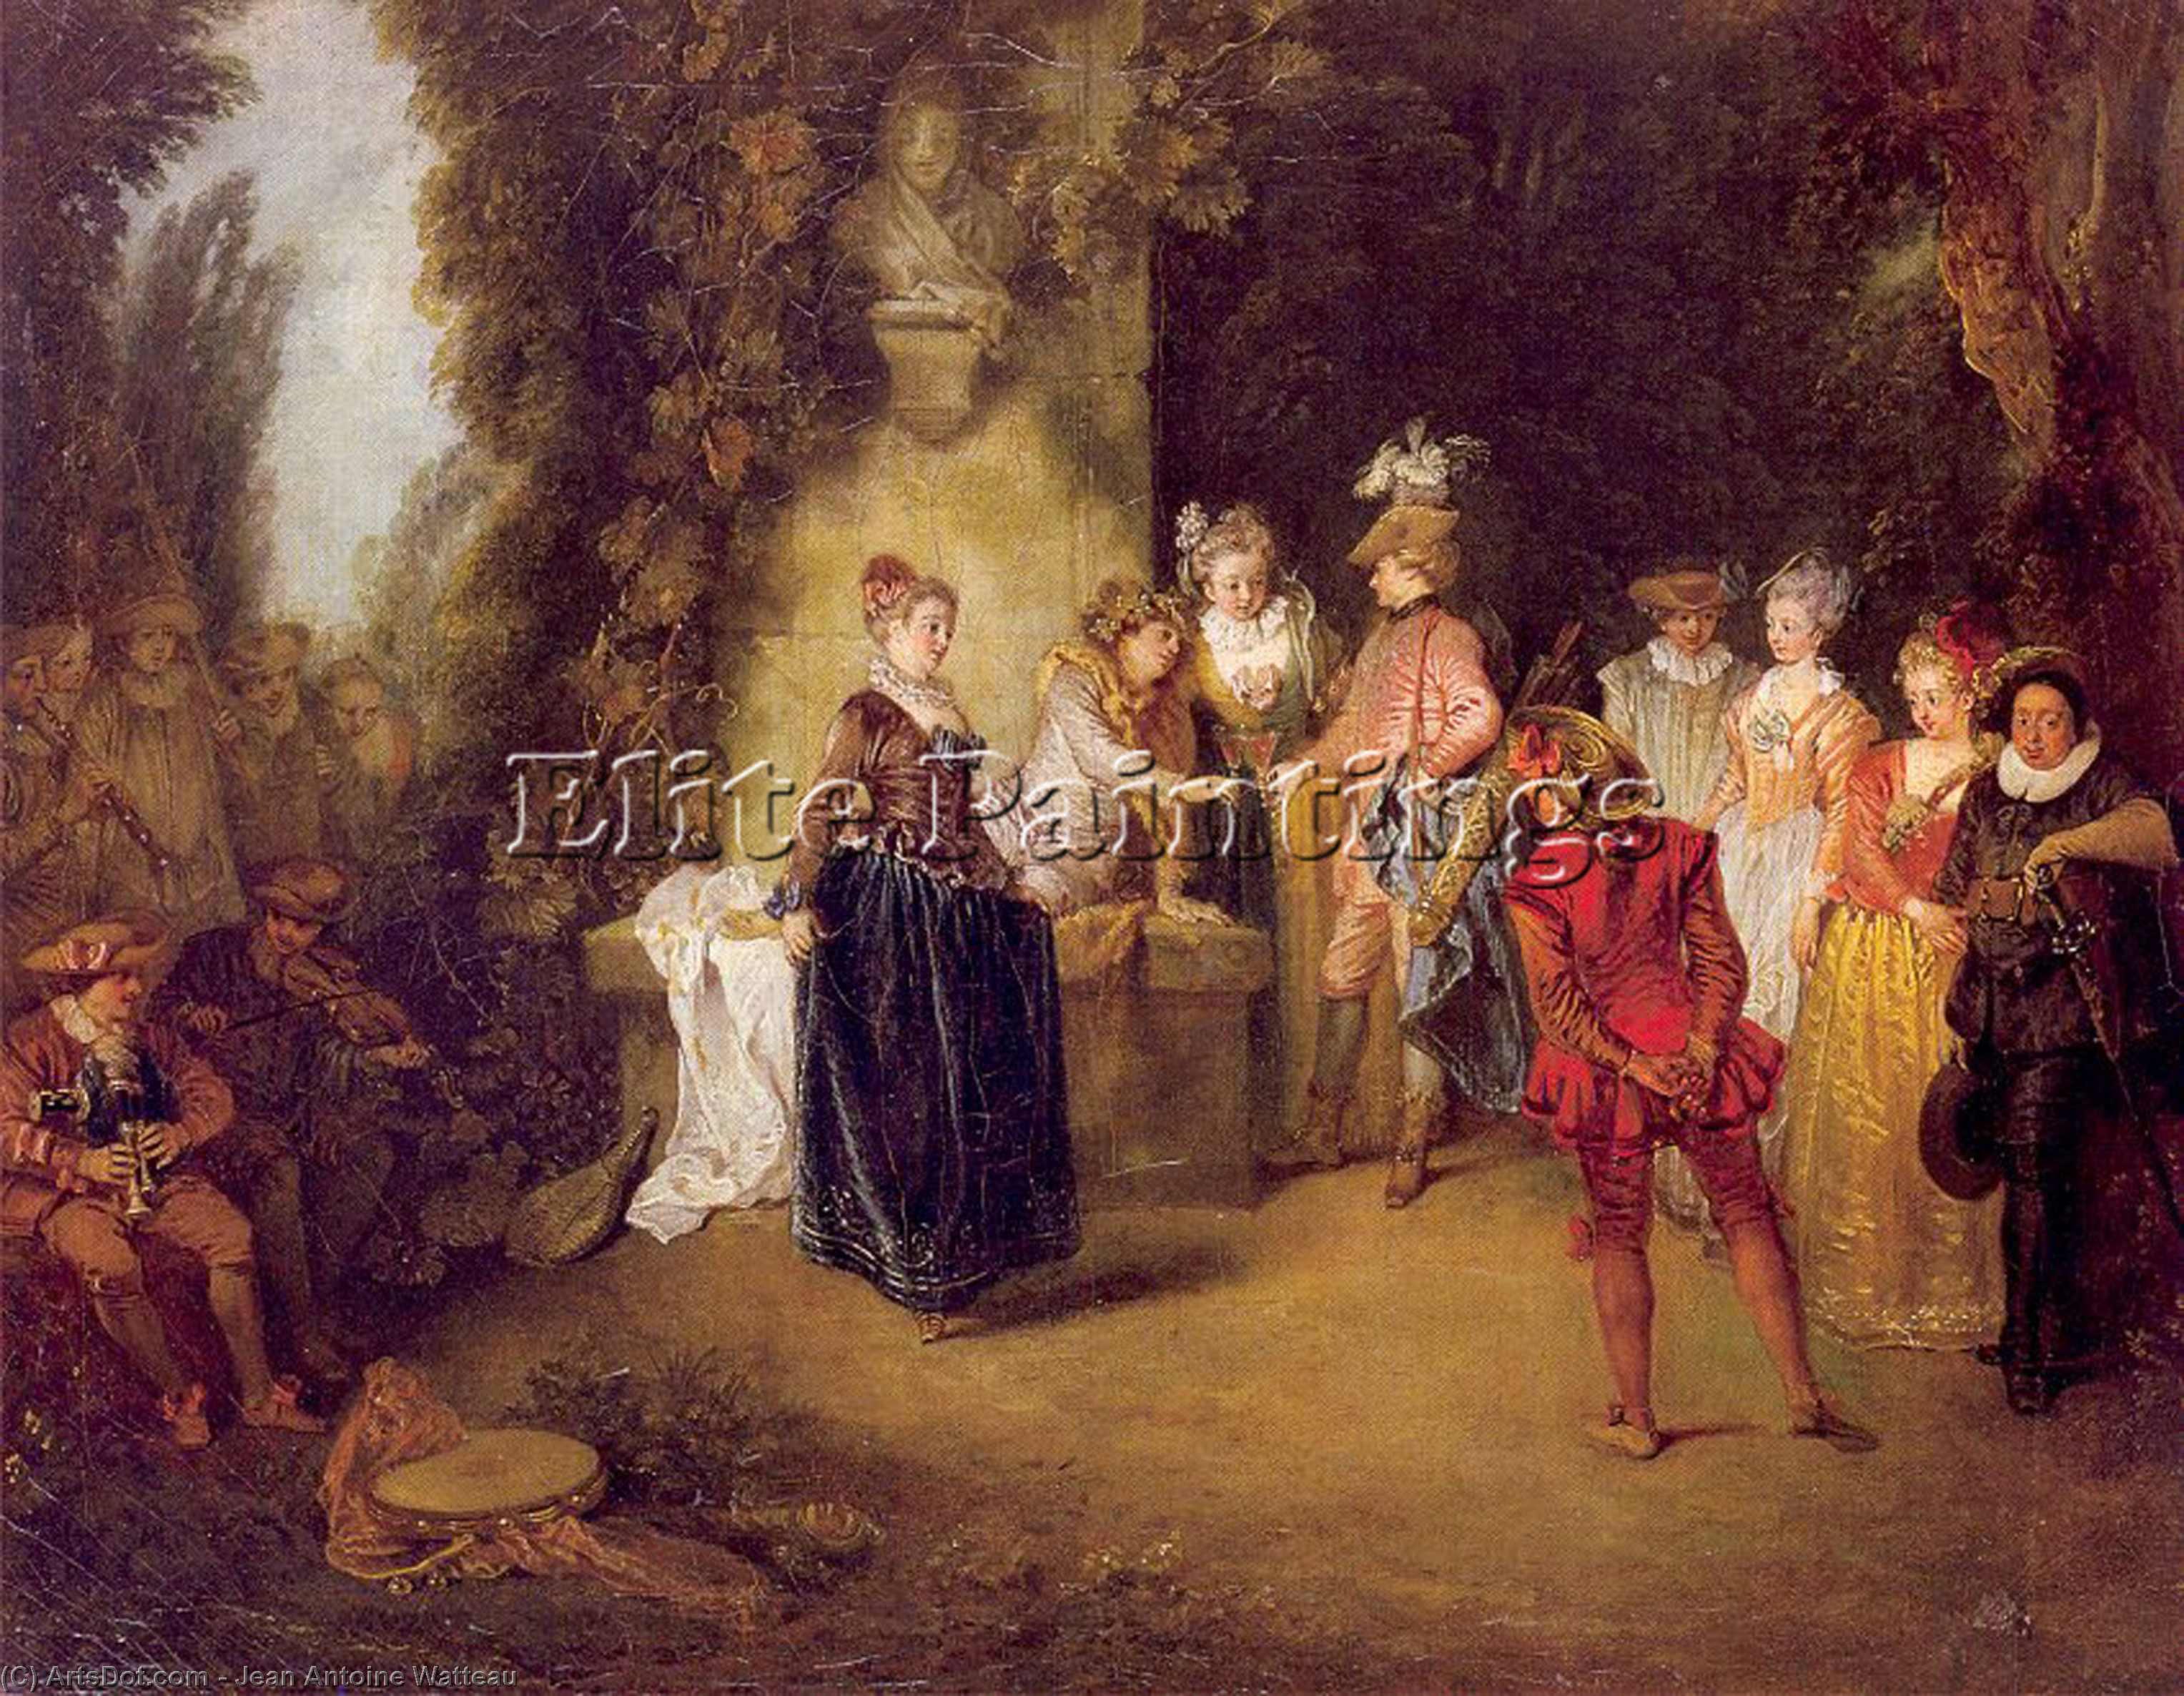 WikiOO.org - Enciklopedija dailės - Tapyba, meno kuriniai Jean Antoine Watteau - The French Theater